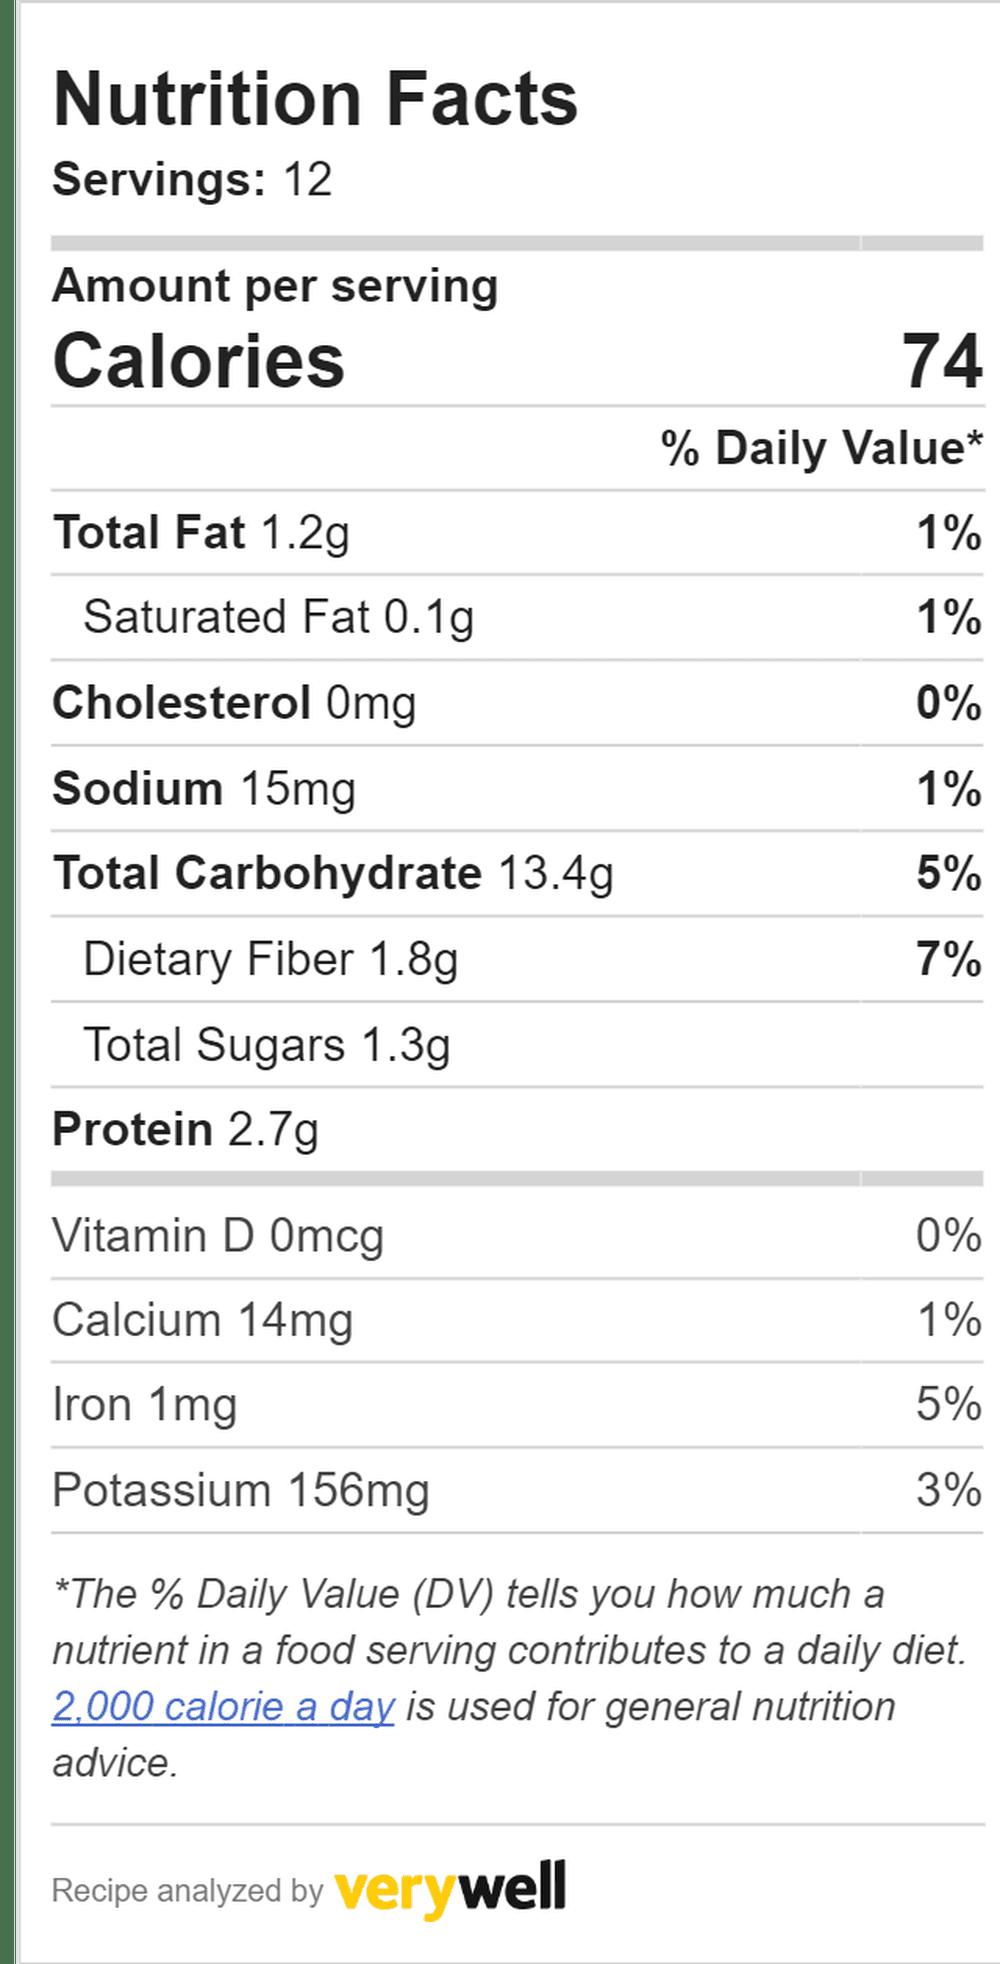 Nutrition label embed 2023430973 666a2fbdc44b4cbf850cfb227eb8b48e